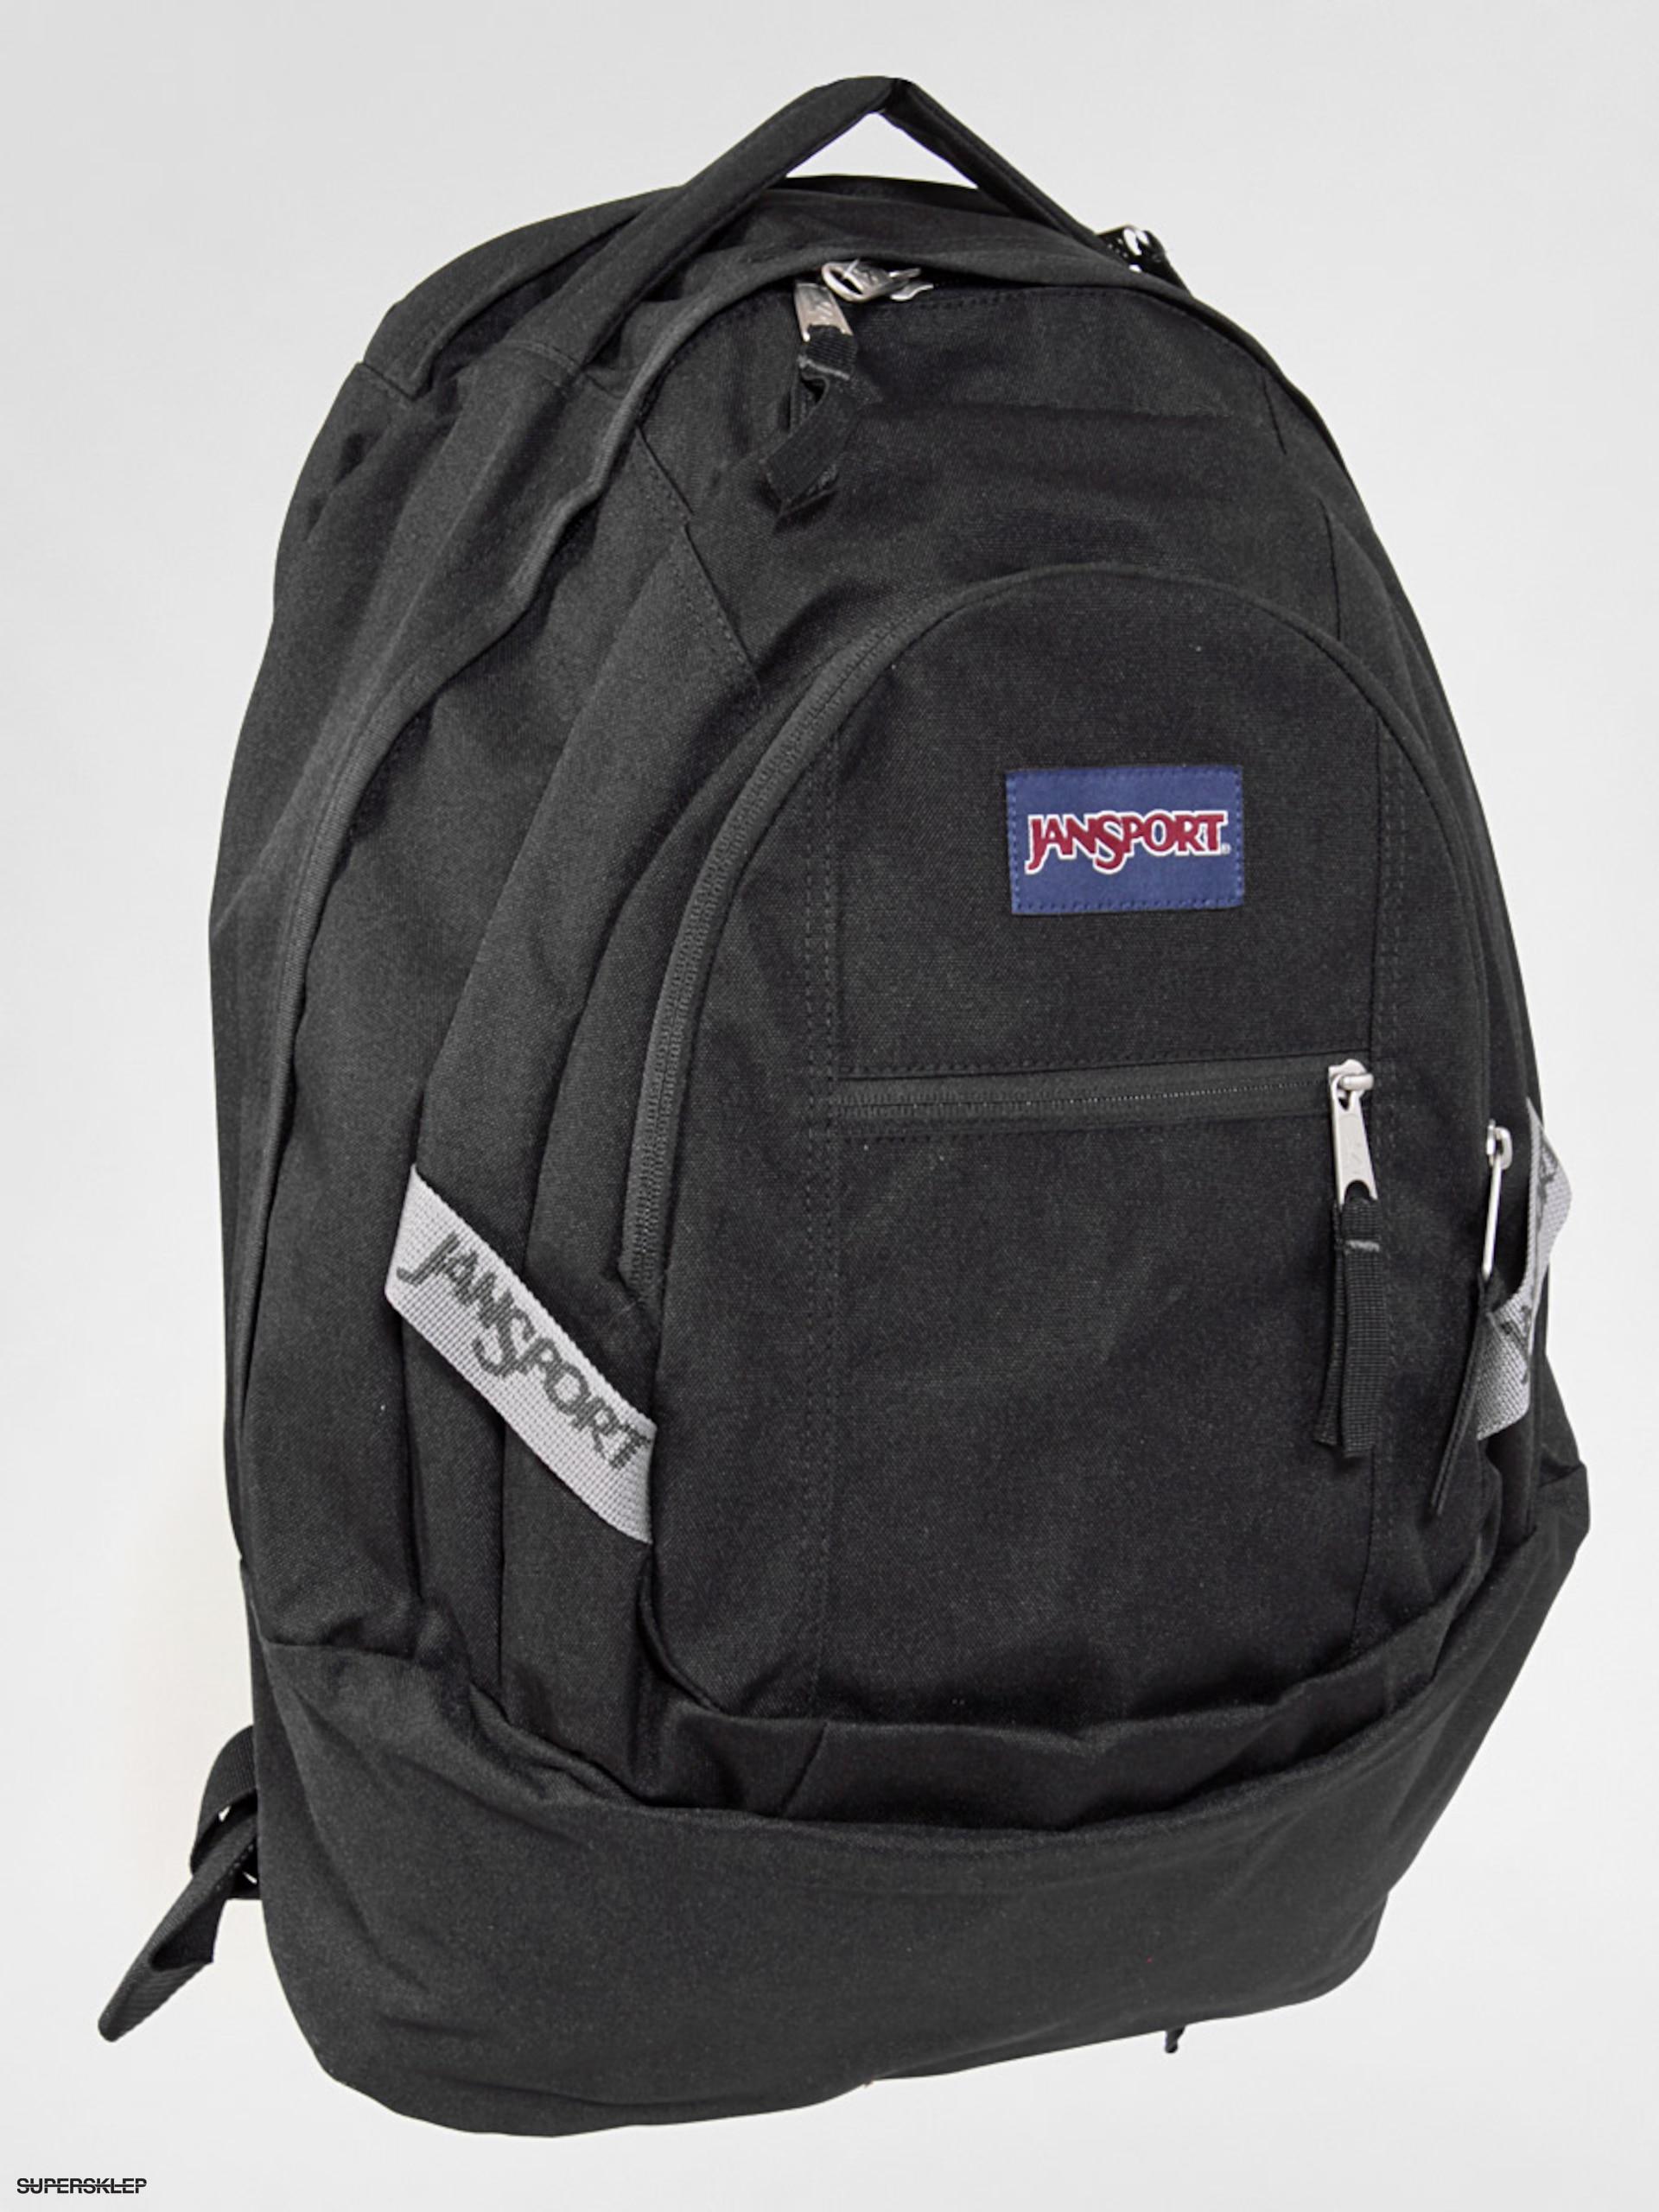 ee470e8ad44ce Plecak Jansport Trinity (black)